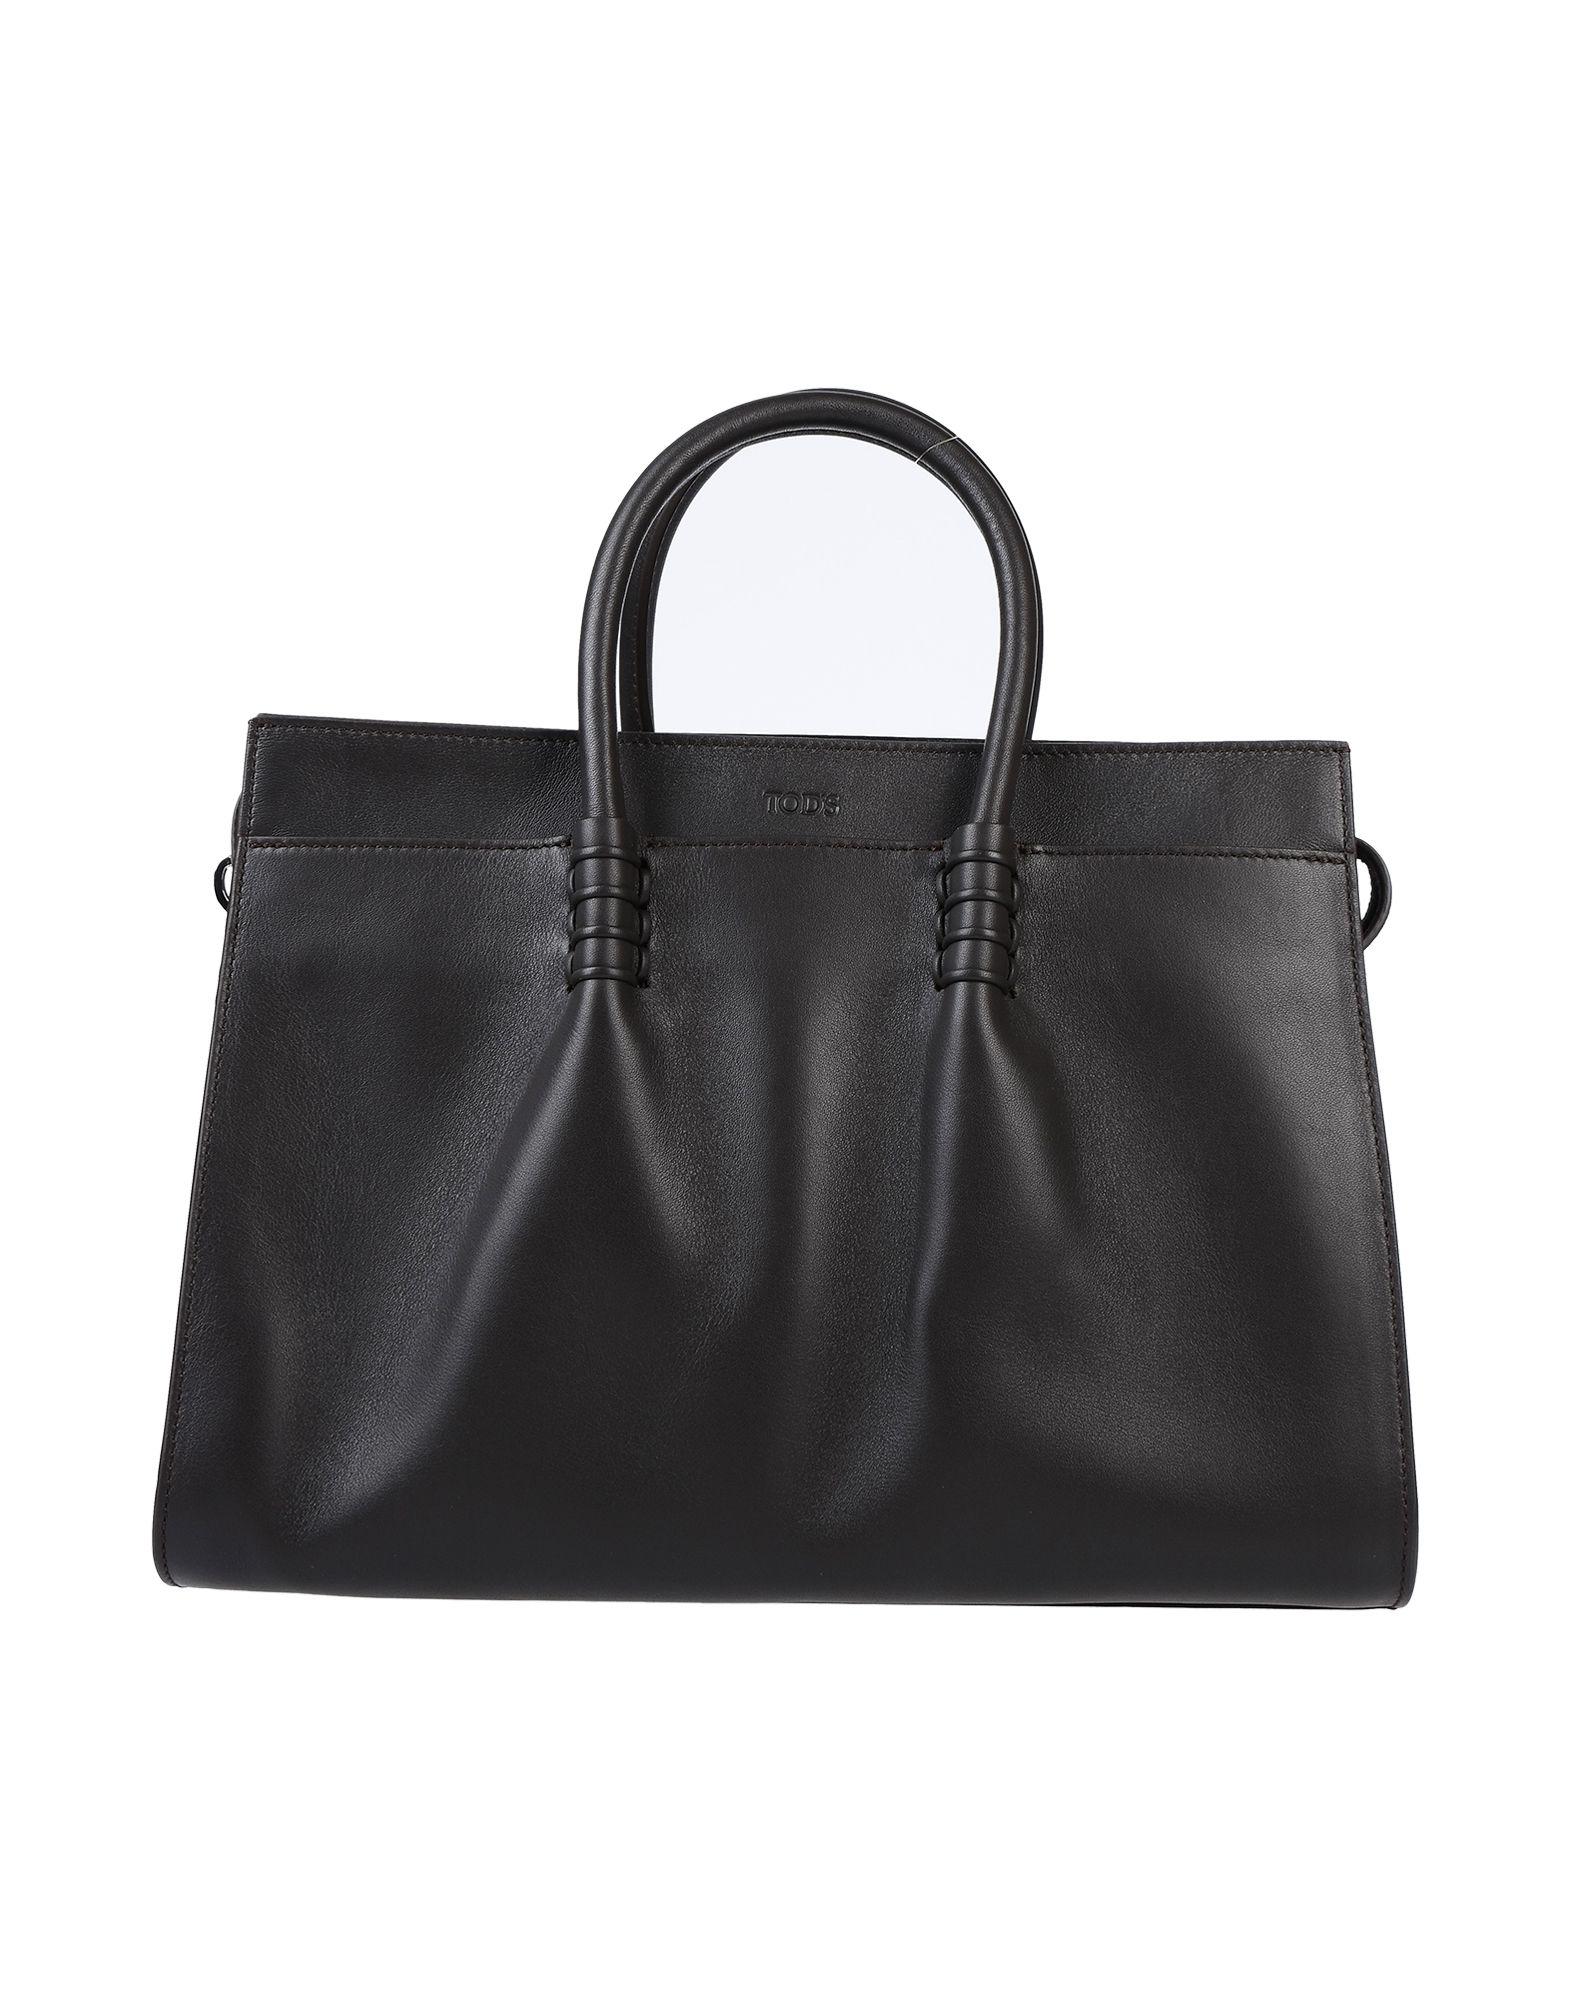 6715a7caca2c Tod's Handbags - Tod's Women - YOOX United States